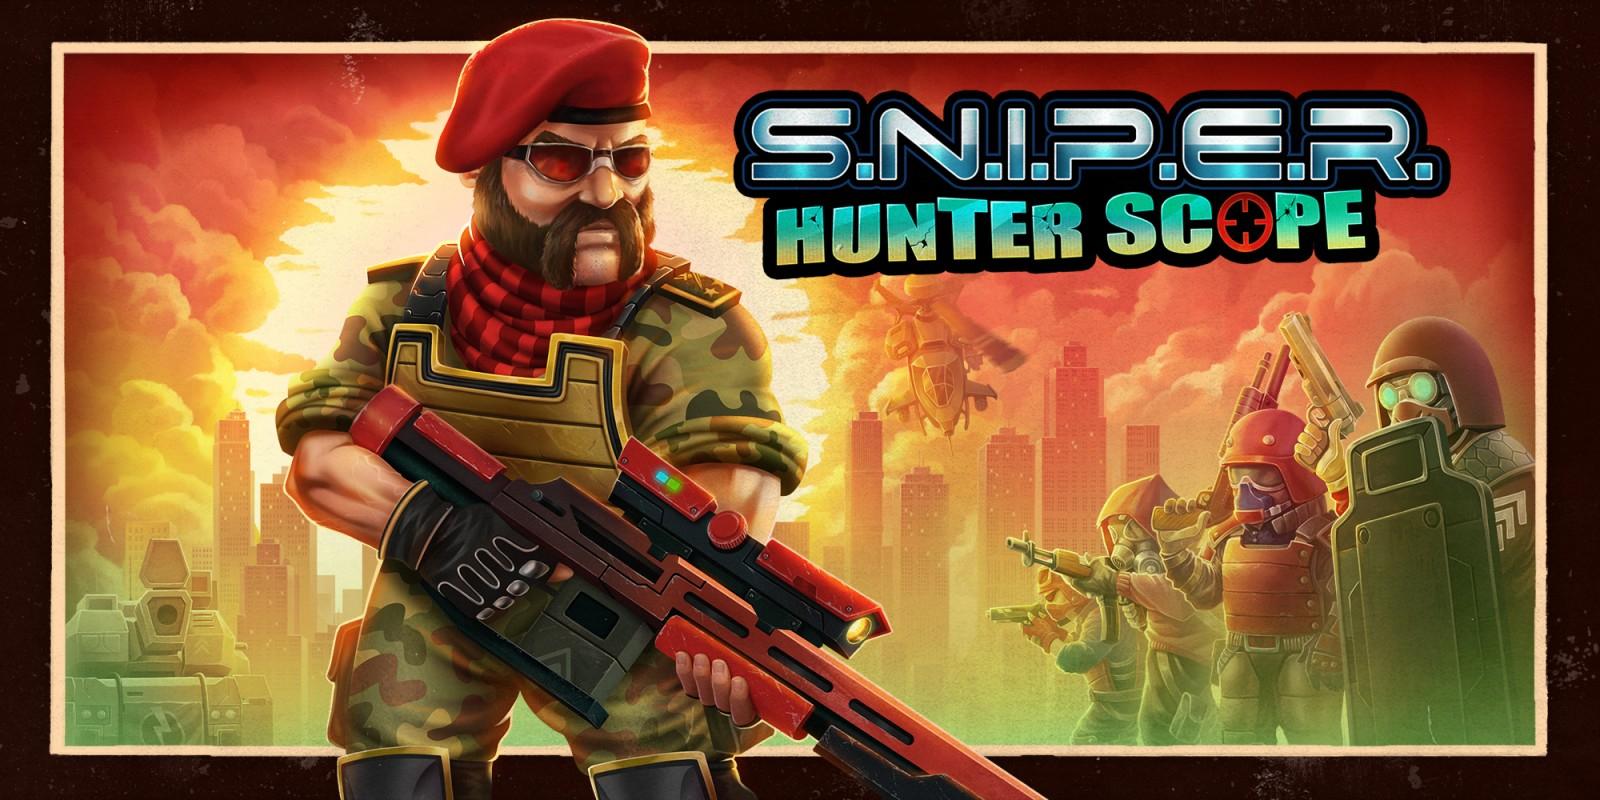 S.N.I.P.E.R. - Hunter Scope - Nintendo eShop